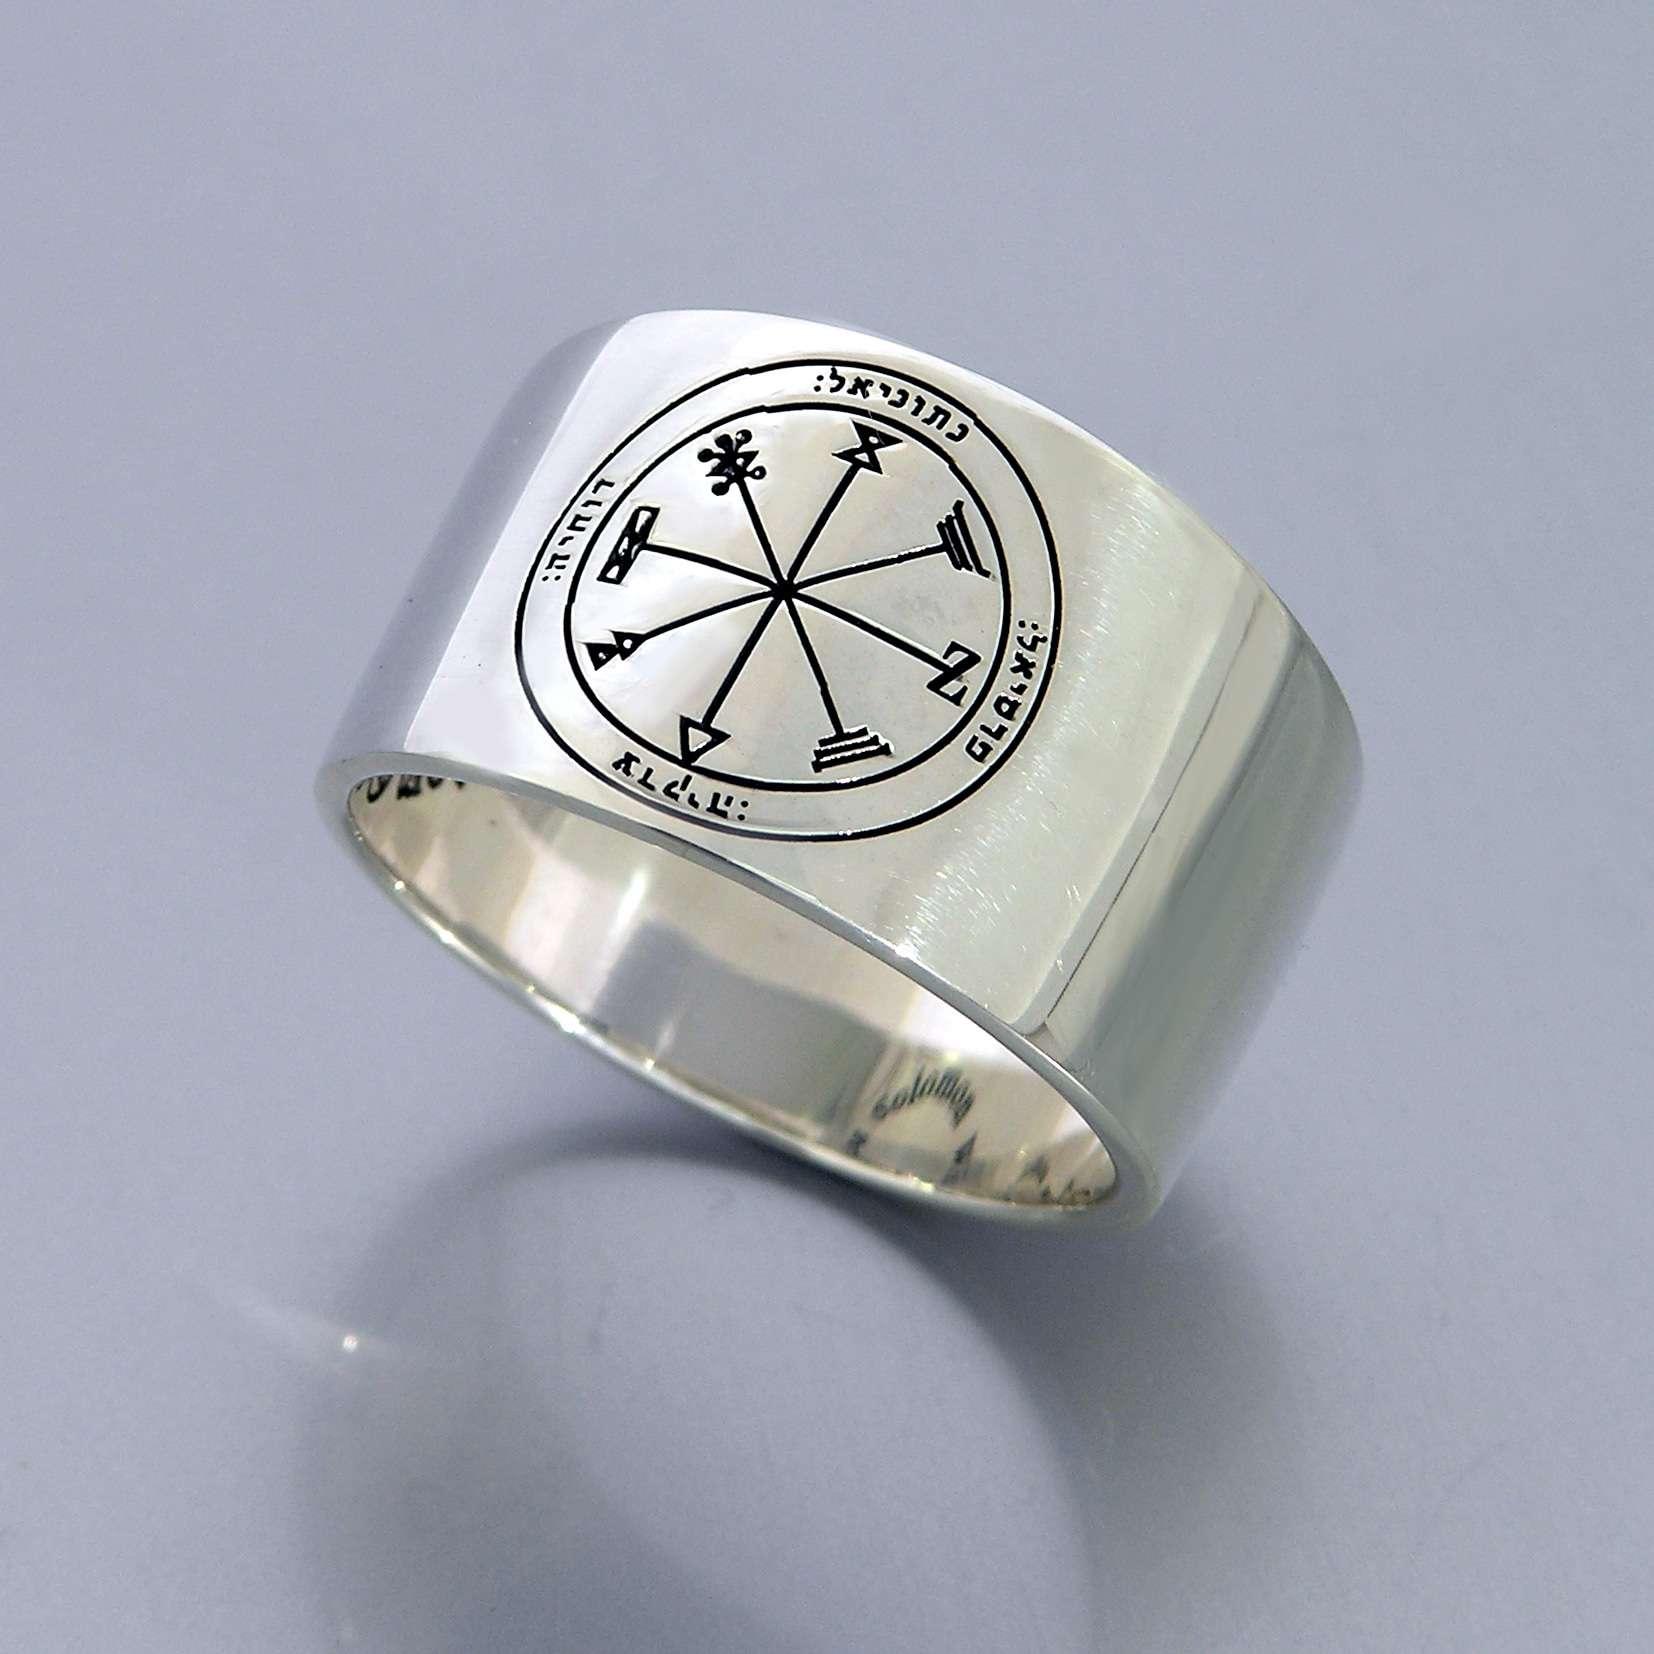 Silver King SolomonSeal Ring - Profusion